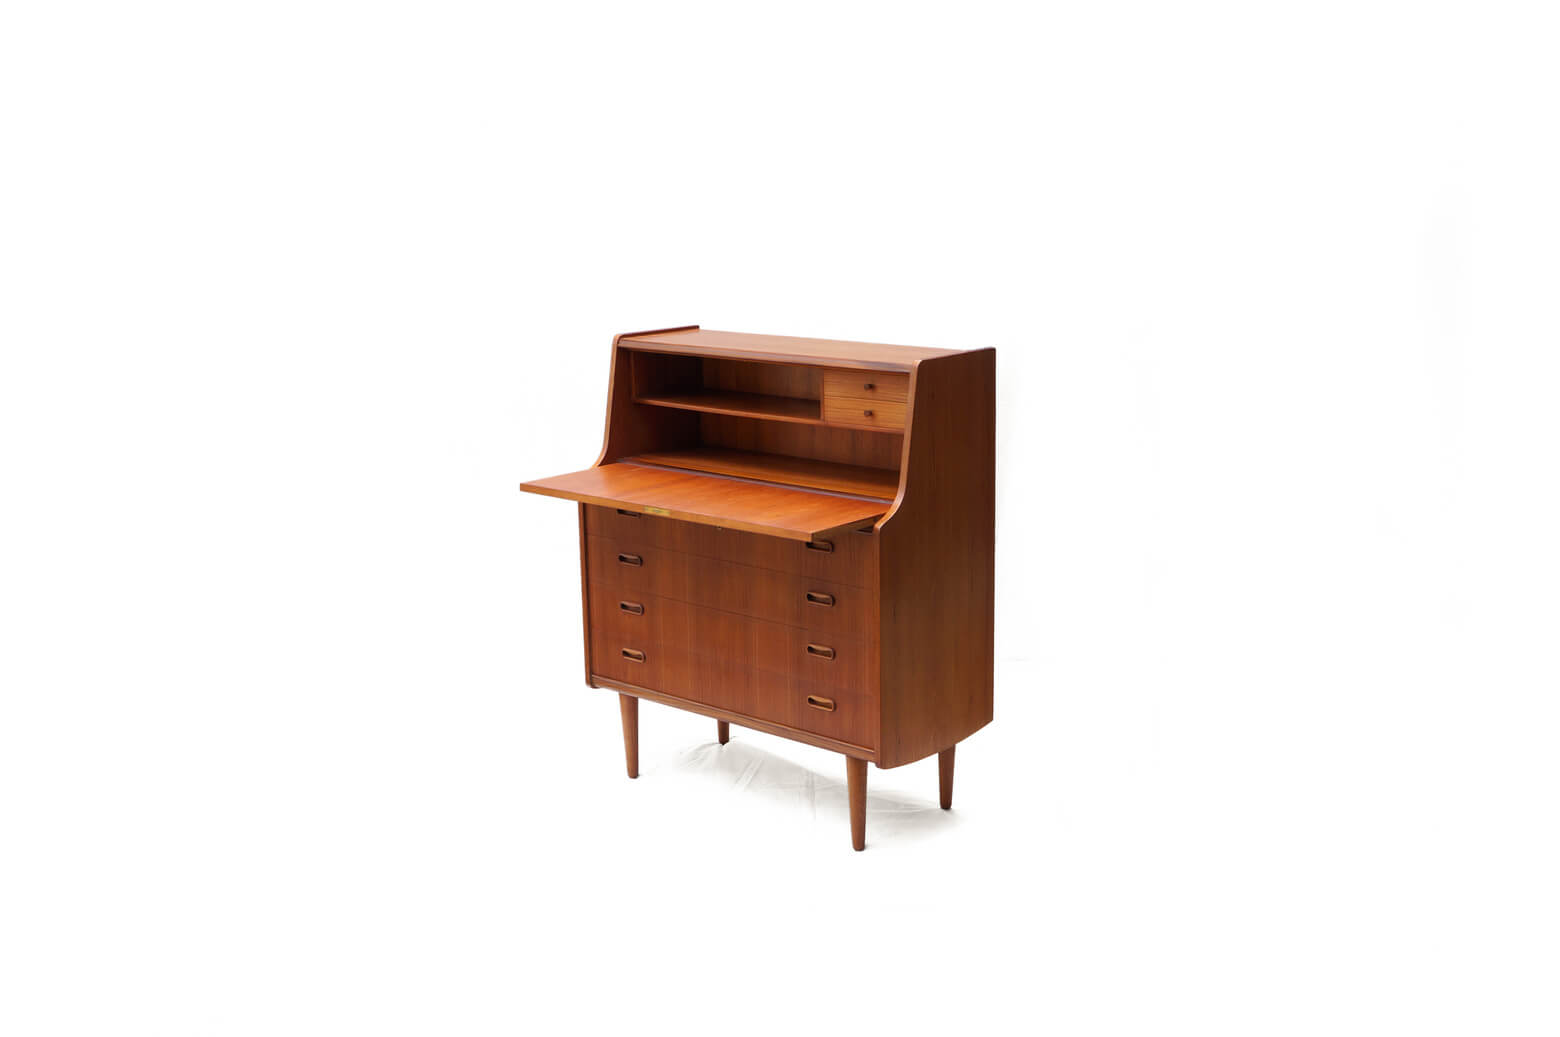 Danish Vintage Writing Bureau/デンマーク ライティングビューロー デスク ヴィンテージ 北欧 家具